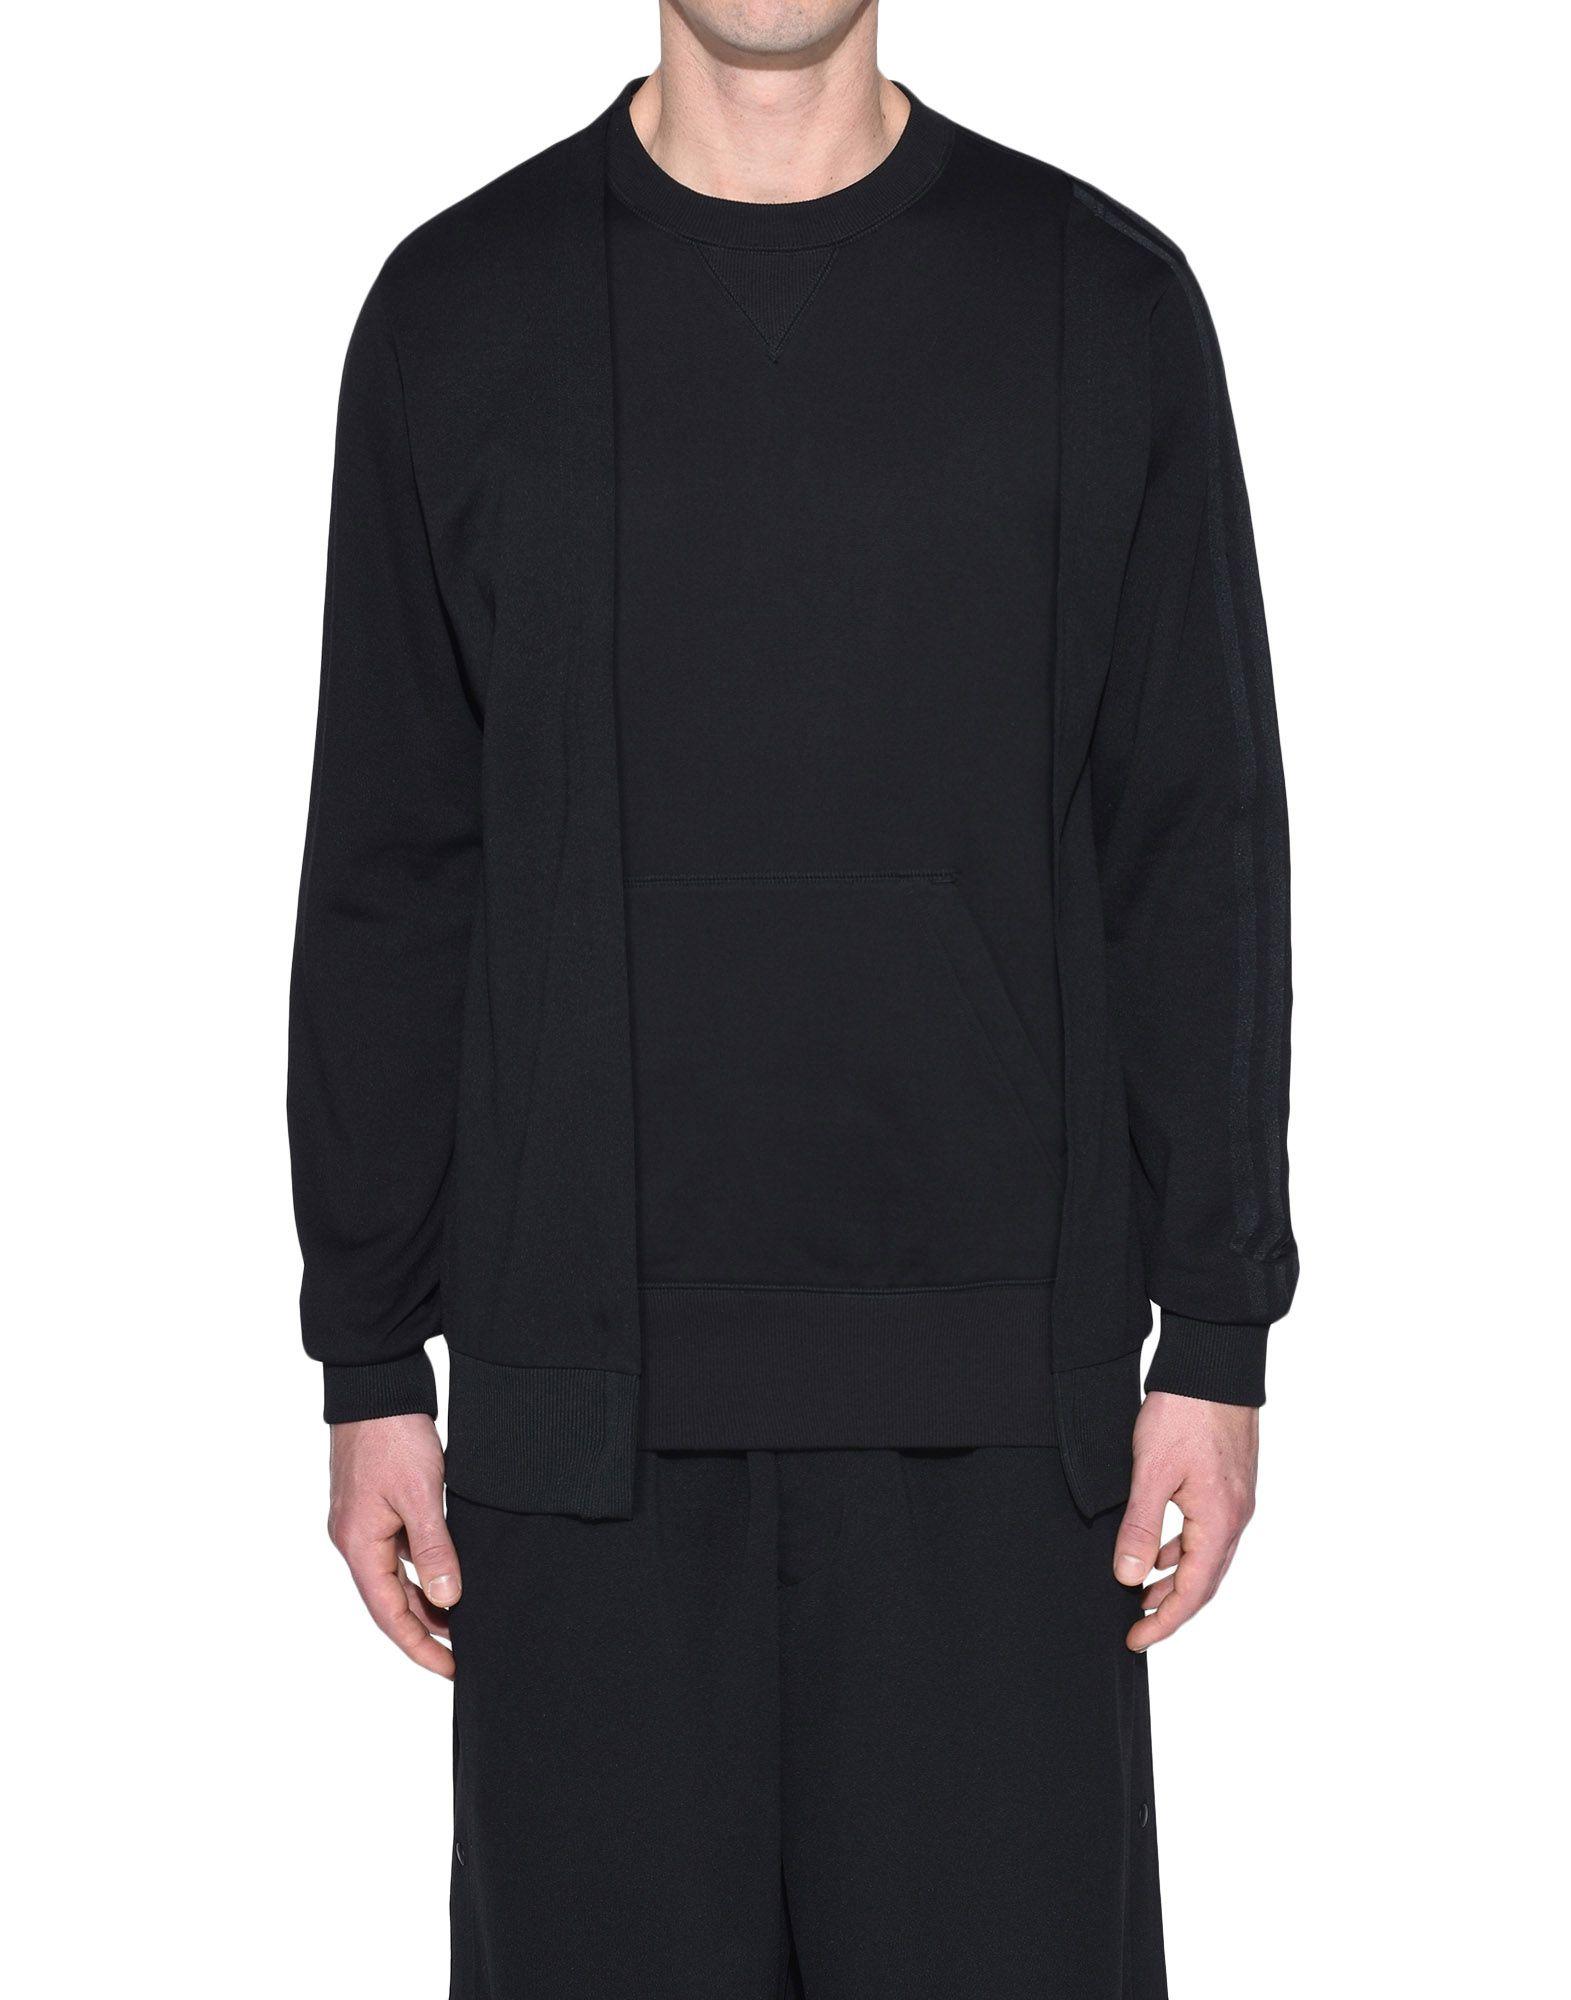 Y-3 Y-3 Patchwork Sweater Sweatshirt Man r